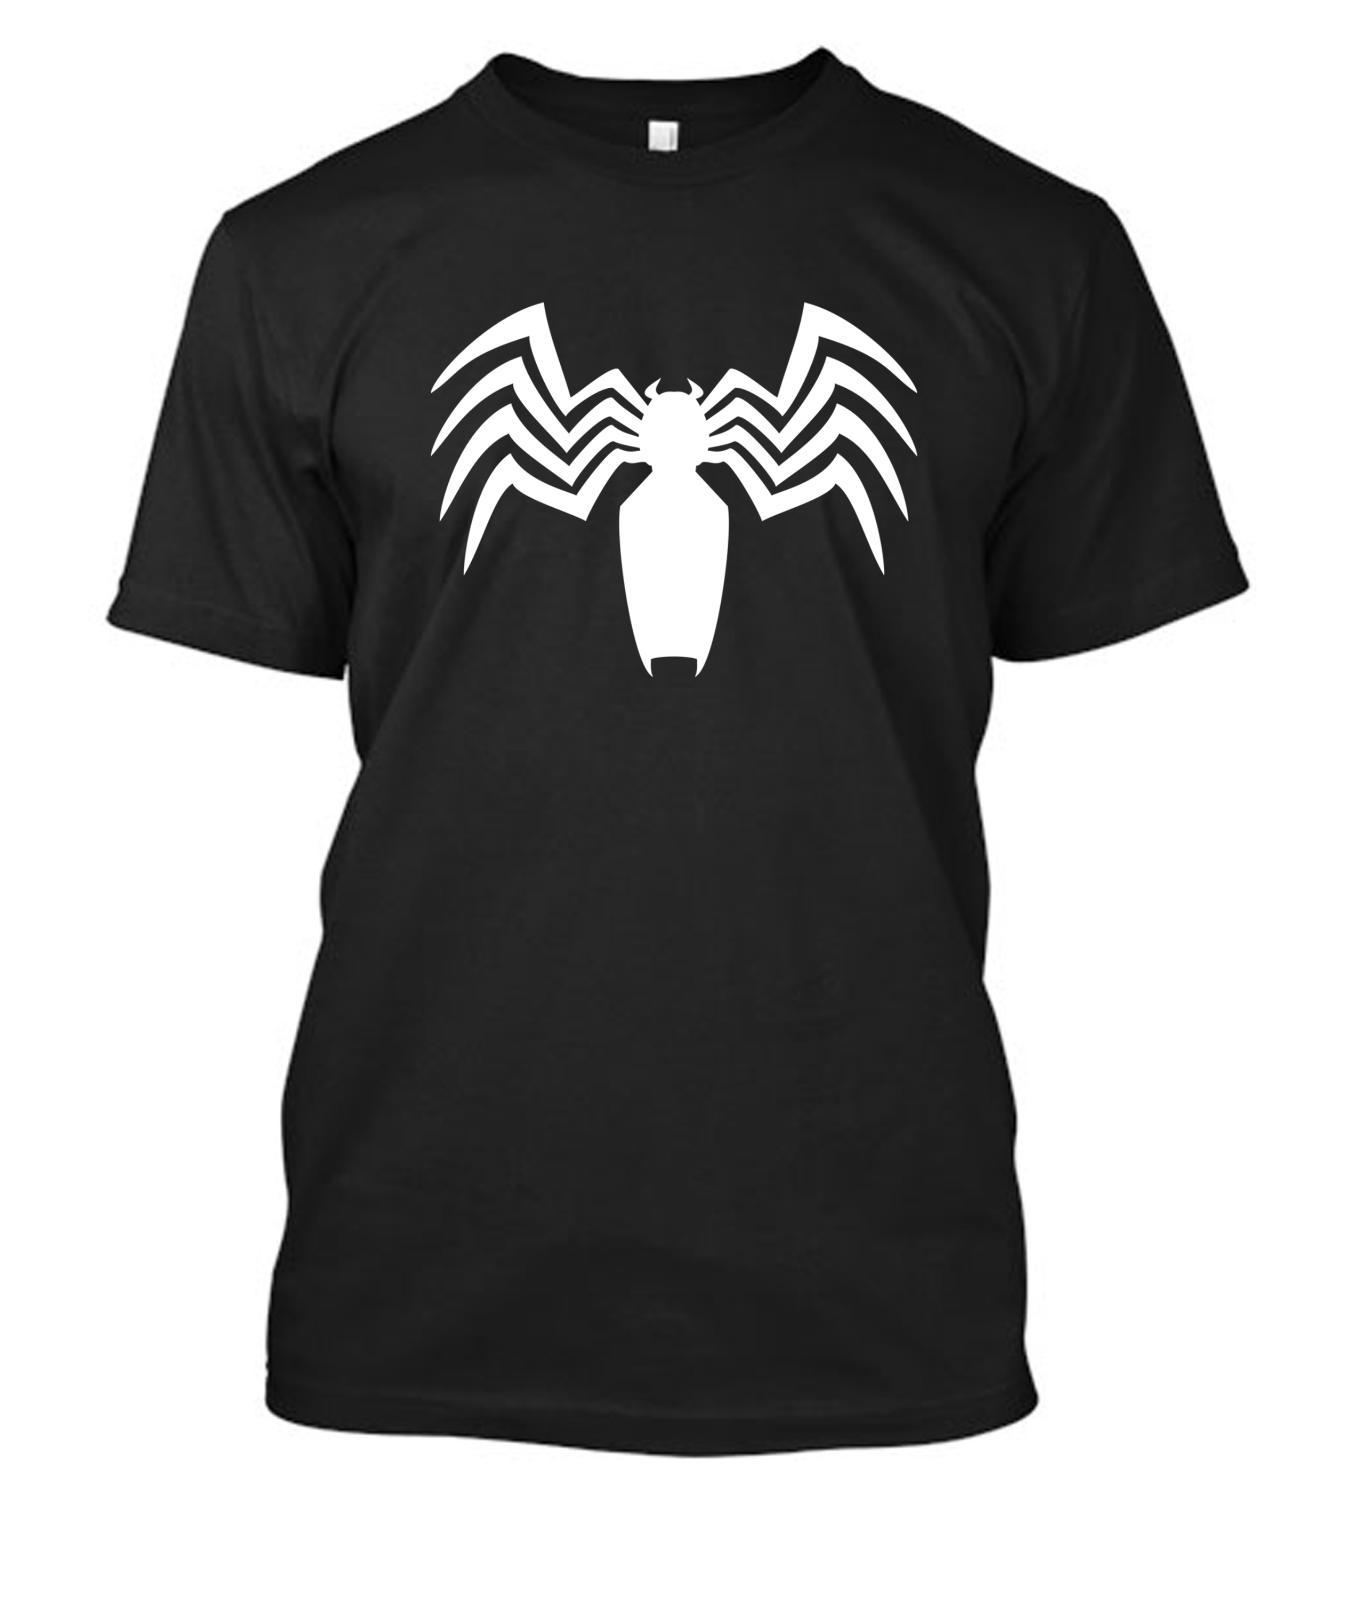 6f2ddd807 VENOM SPIDER LOGO Spiderman T Shirt Tee Shirt Tshirt Black Or White Vinyl  Print Funny Unisex Casual Tee Gift Crazy T Shirt Sayings Tee Shirt Shop  Online ...